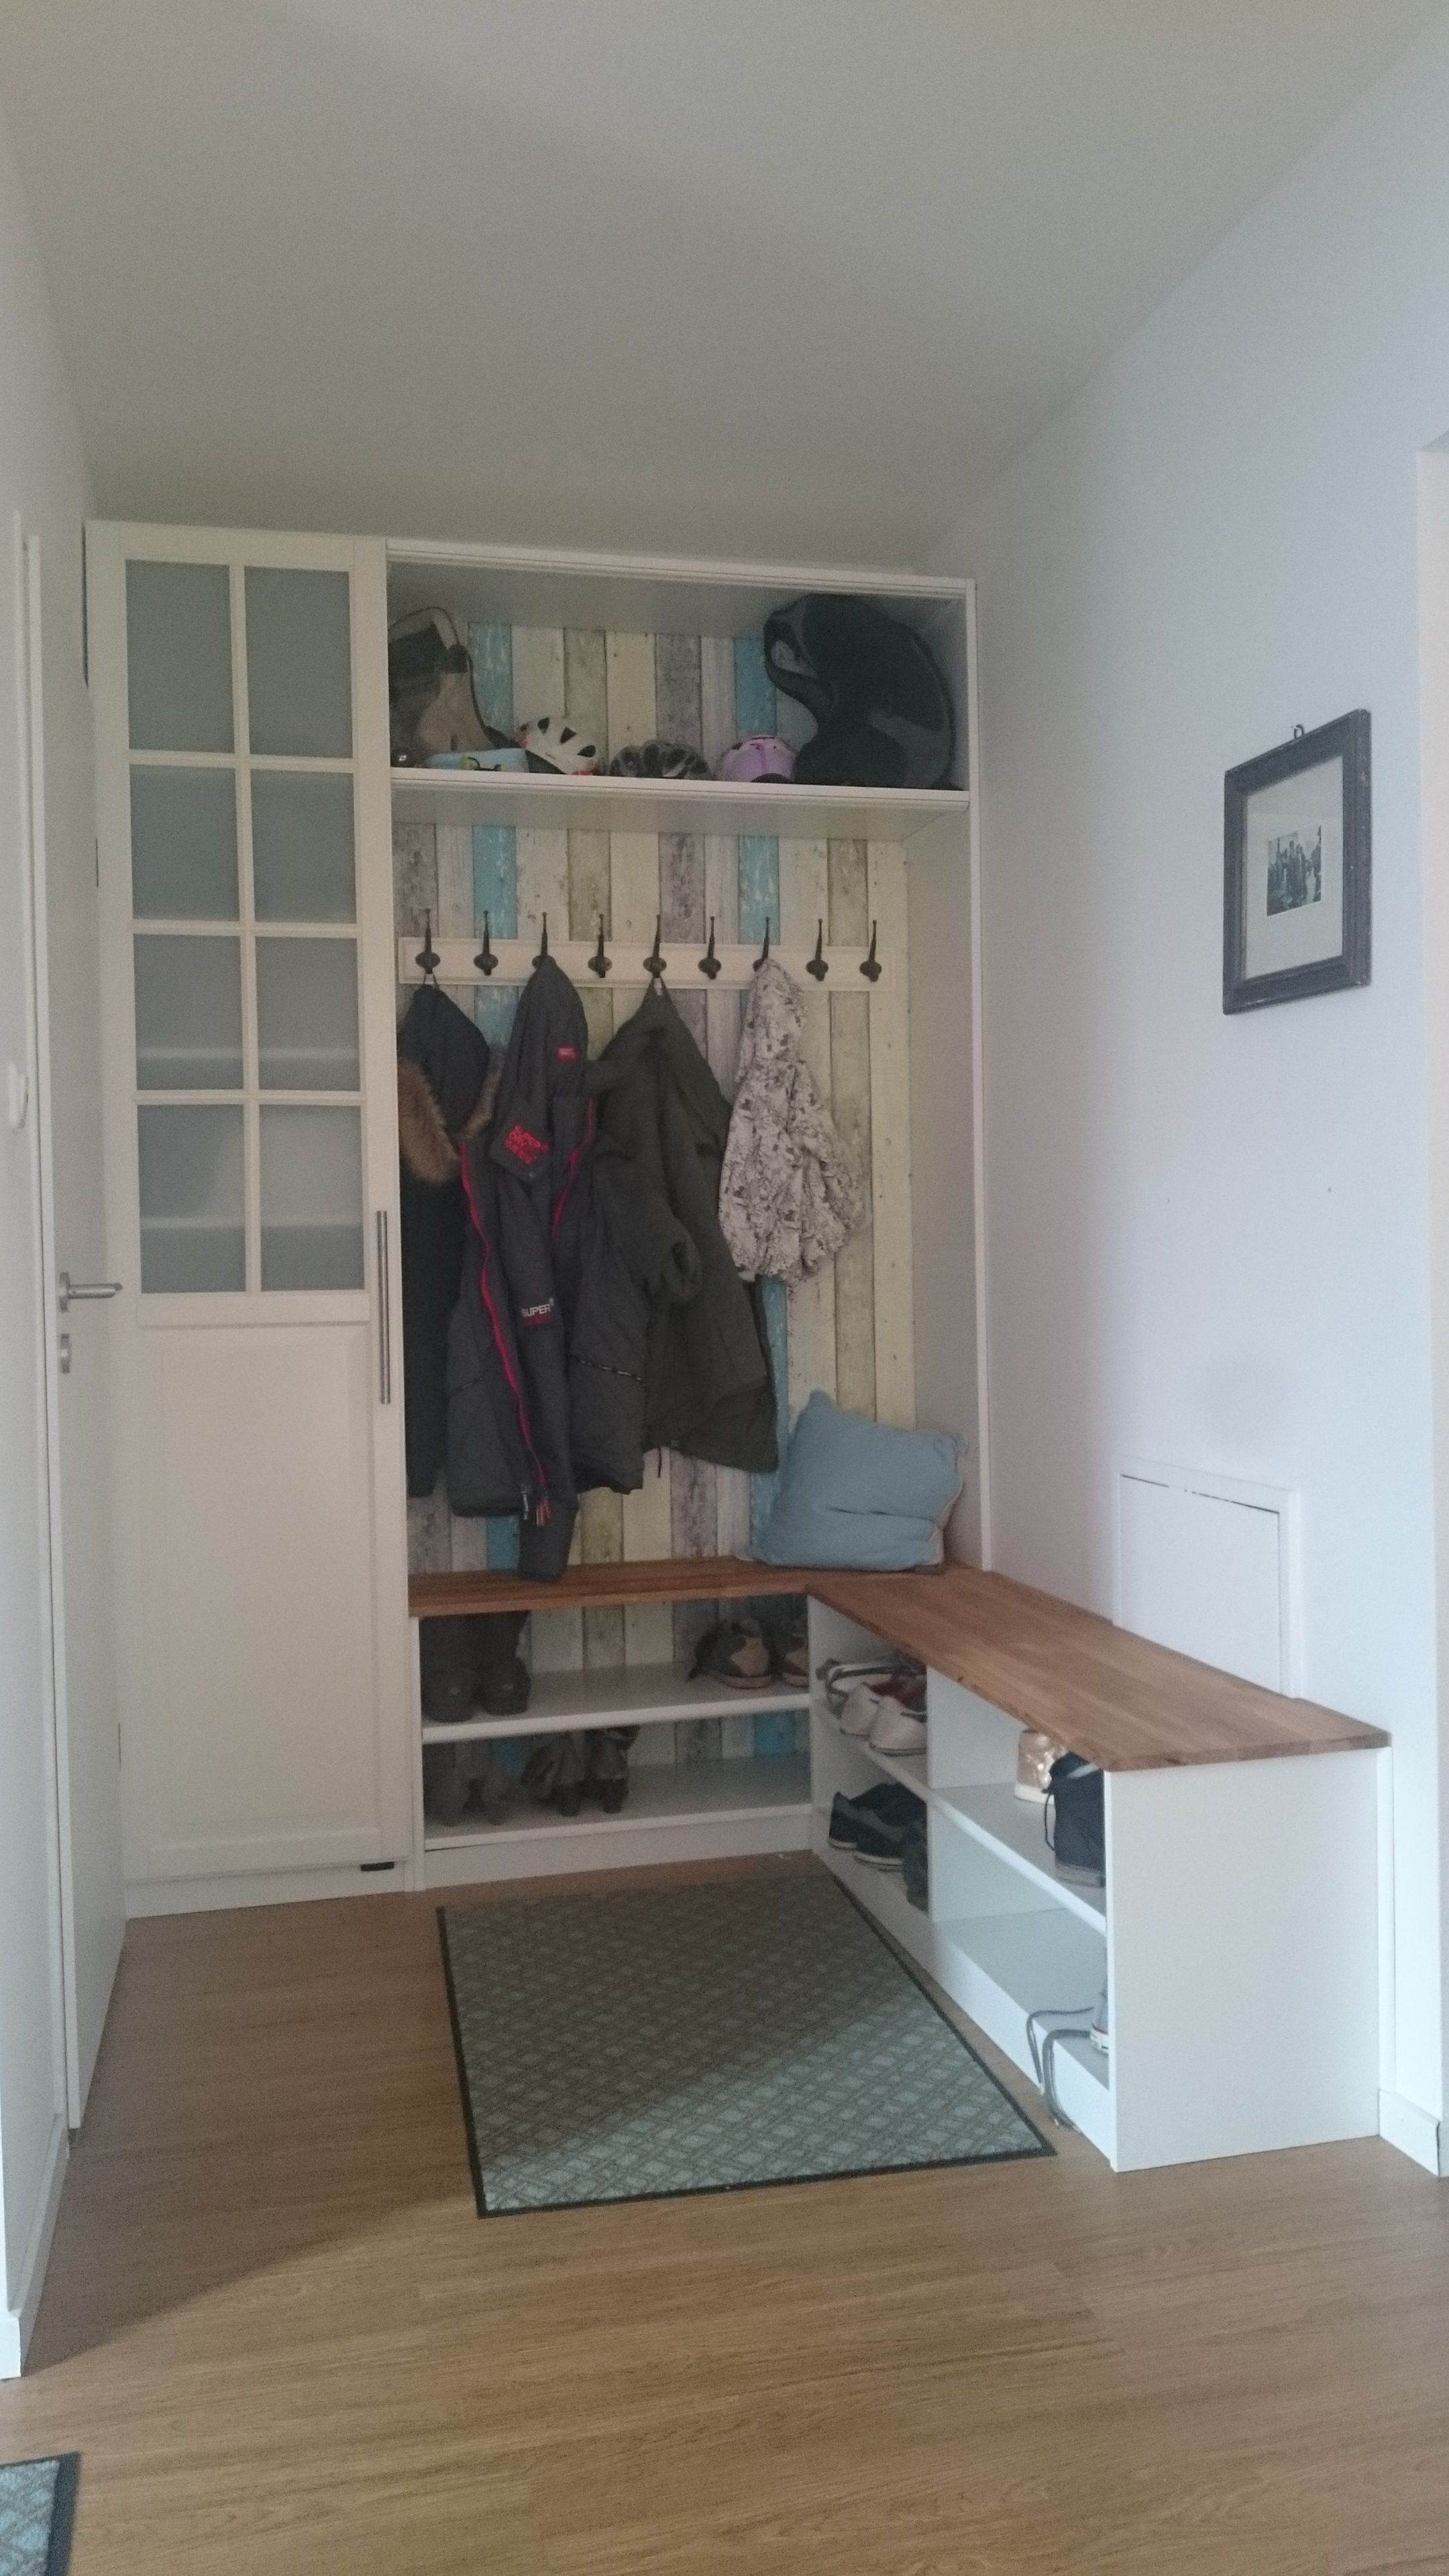 neue garderobe f r den flur bauanleitung zum selber bauen flur pinterest bauanleitung. Black Bedroom Furniture Sets. Home Design Ideas